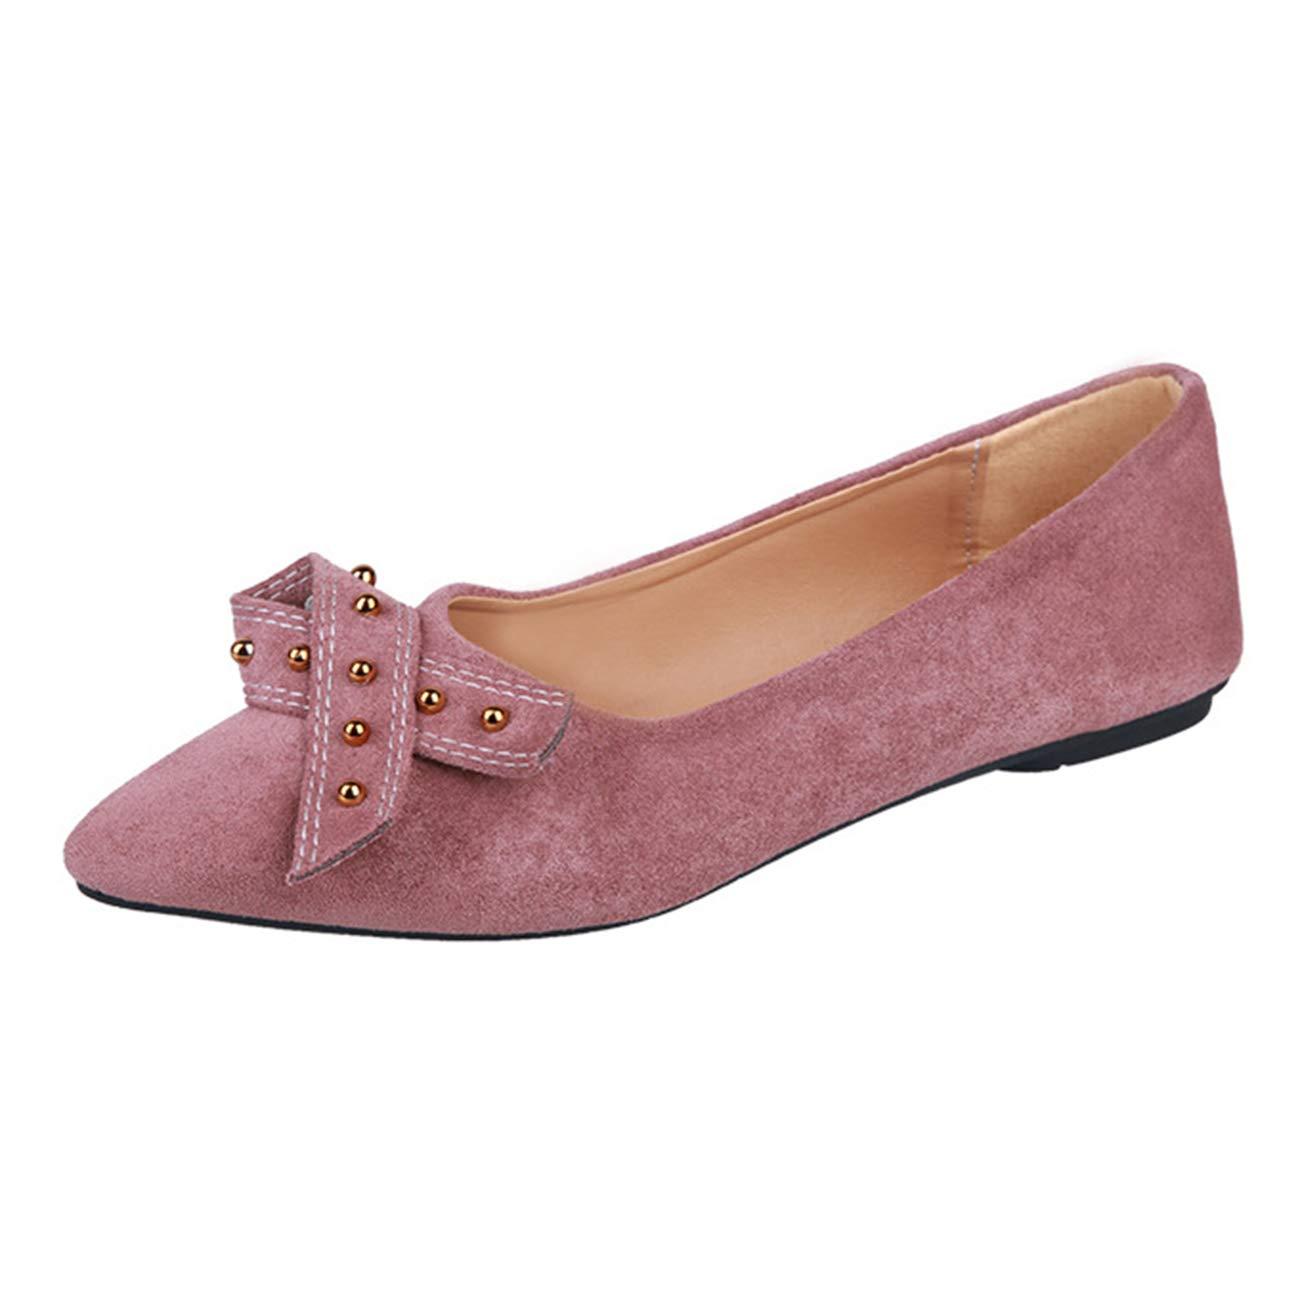 Mashiaoyi Womens Pointed-Toe Bowknot Flat Beaded Ballet Flats